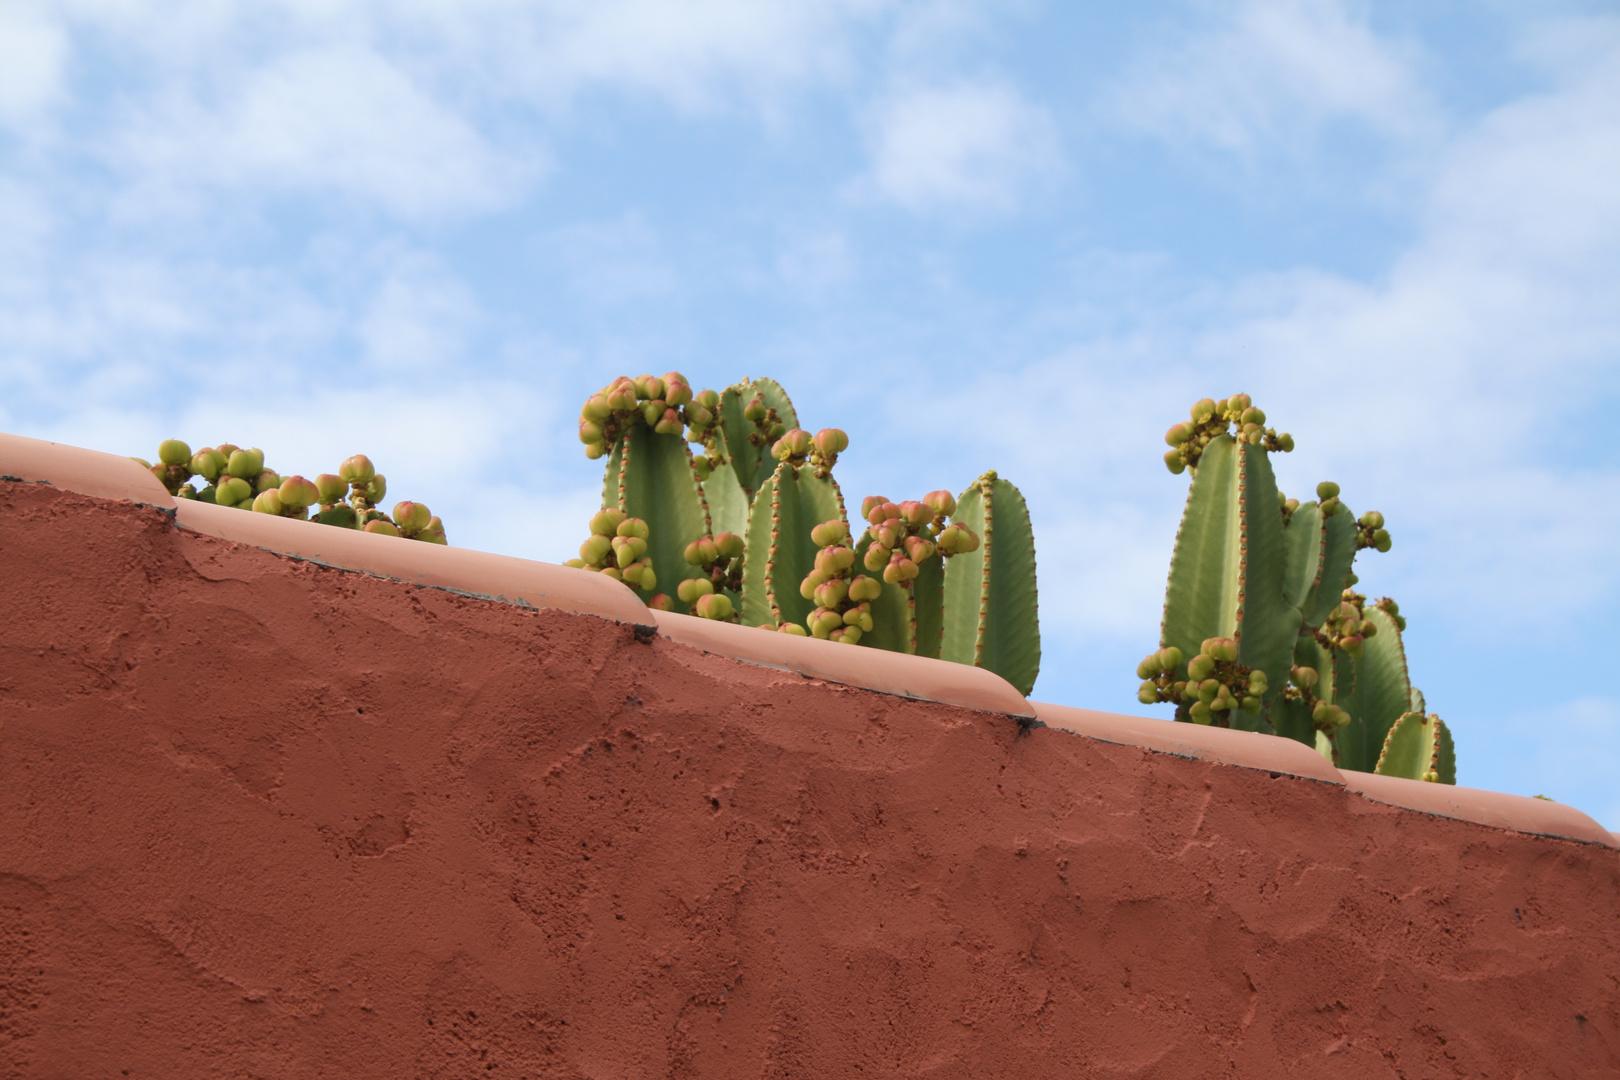 Kakteen als Zaungäste auf La Palma